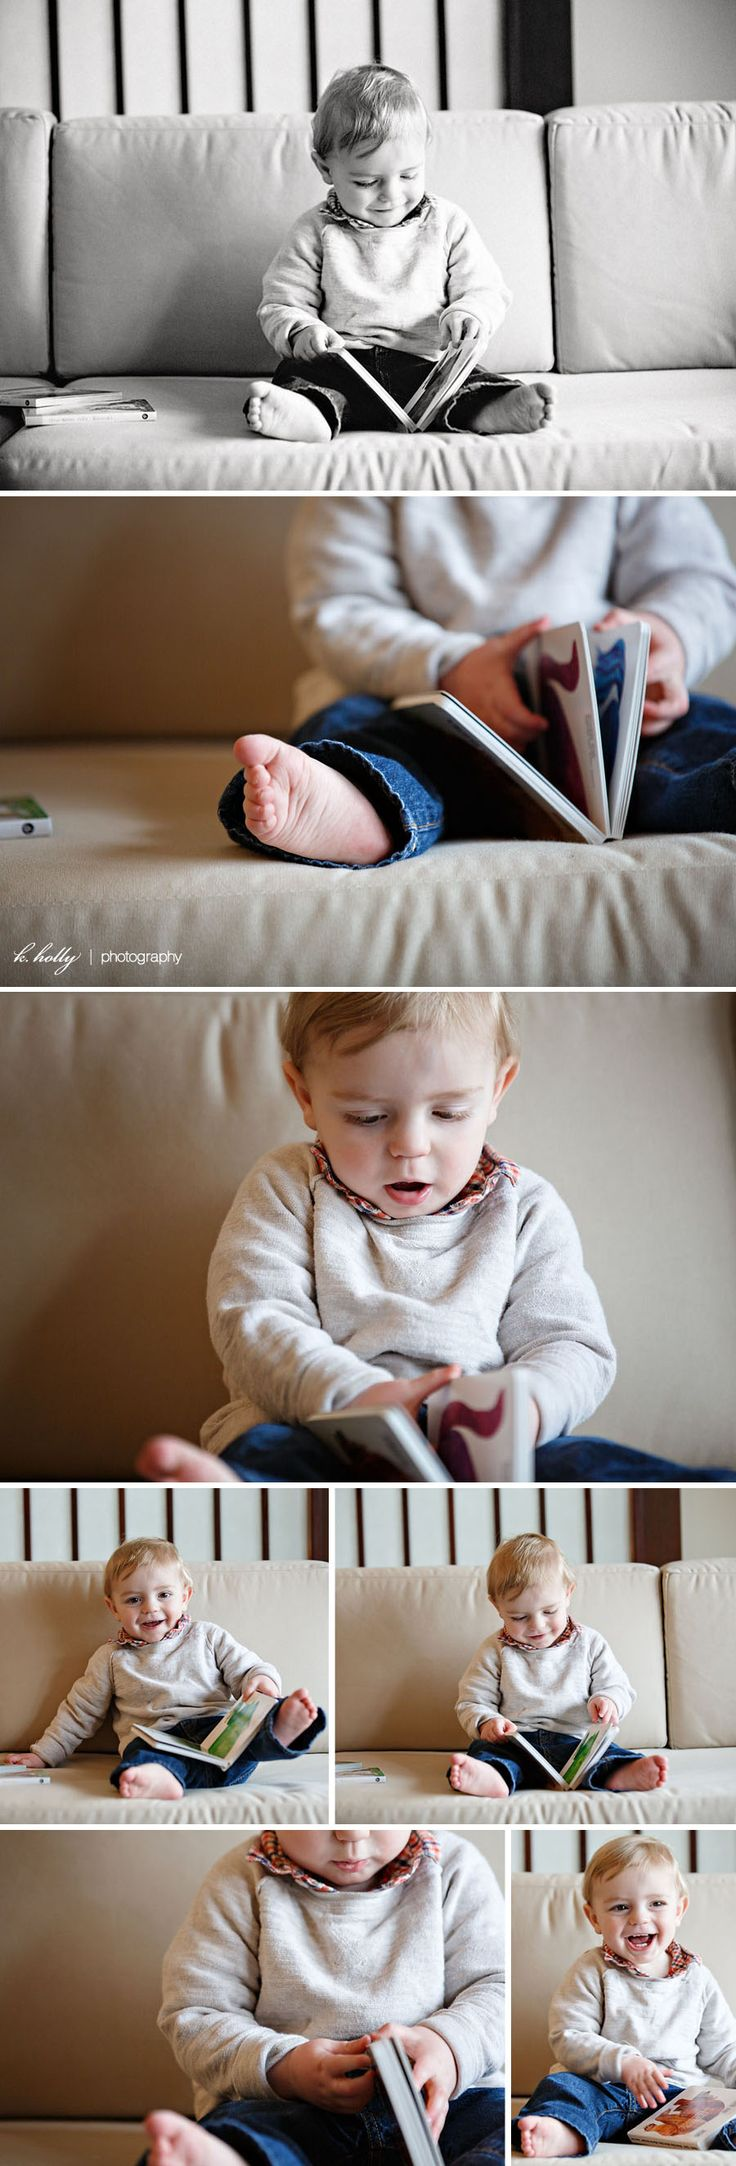 Jackson :: 18 months!  |  k. holly